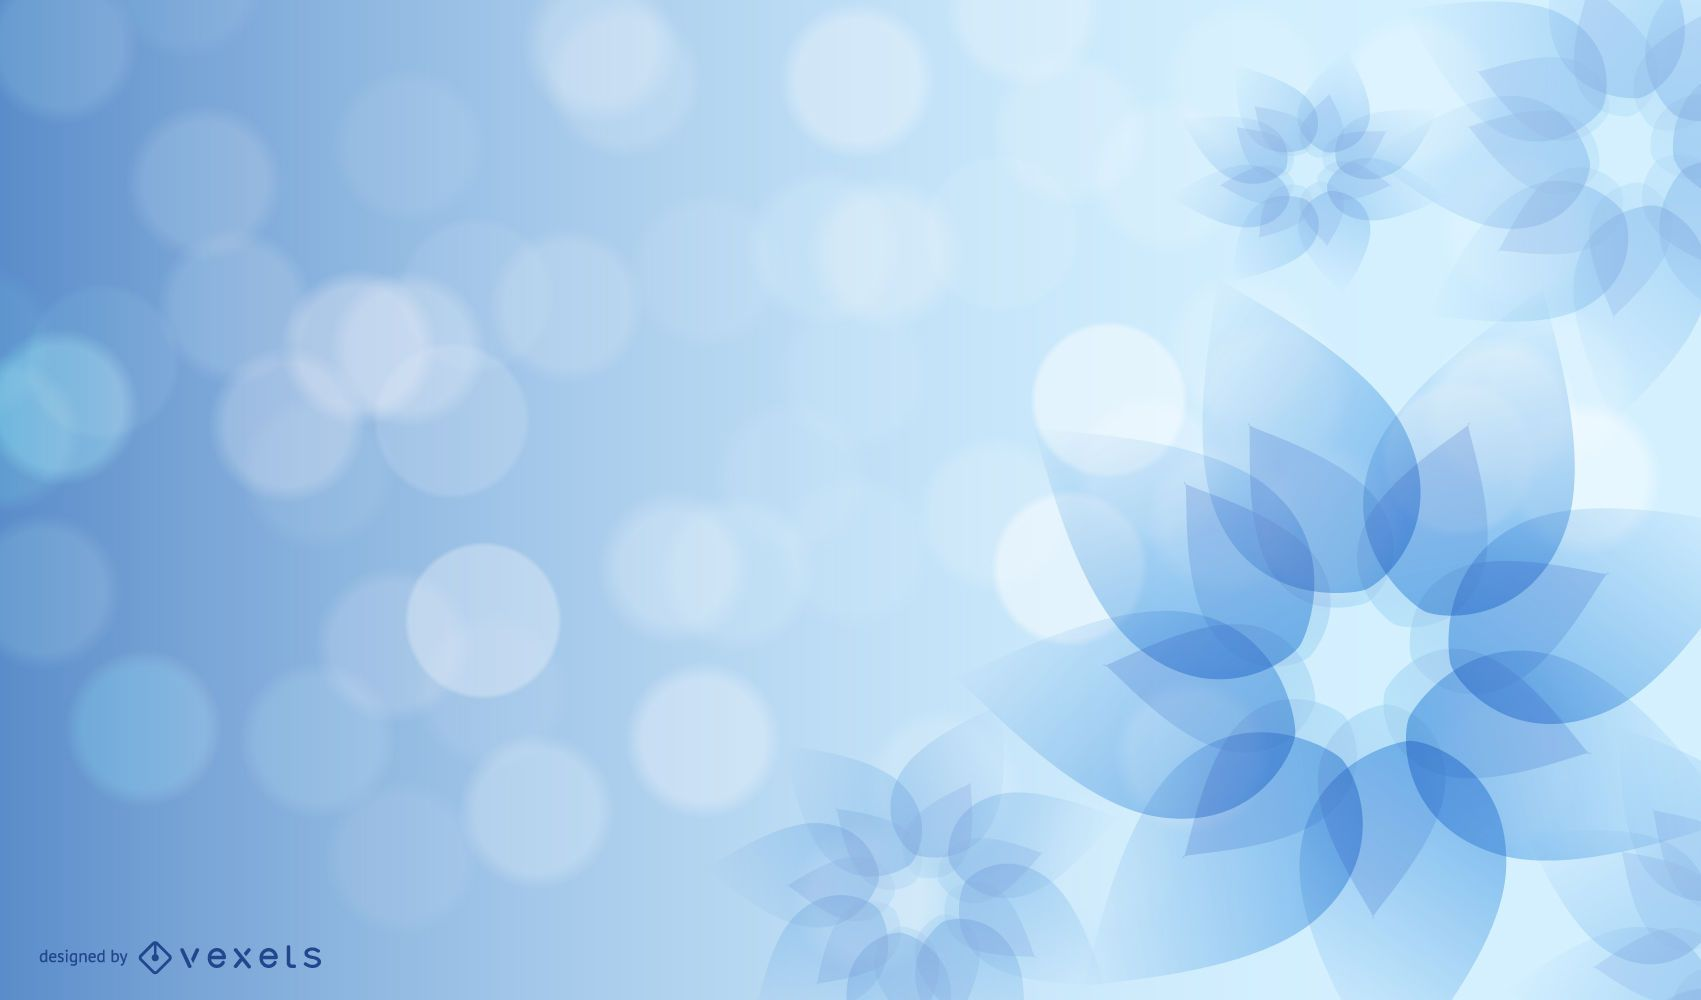 Flor abstracta azul con resplandores brillantes